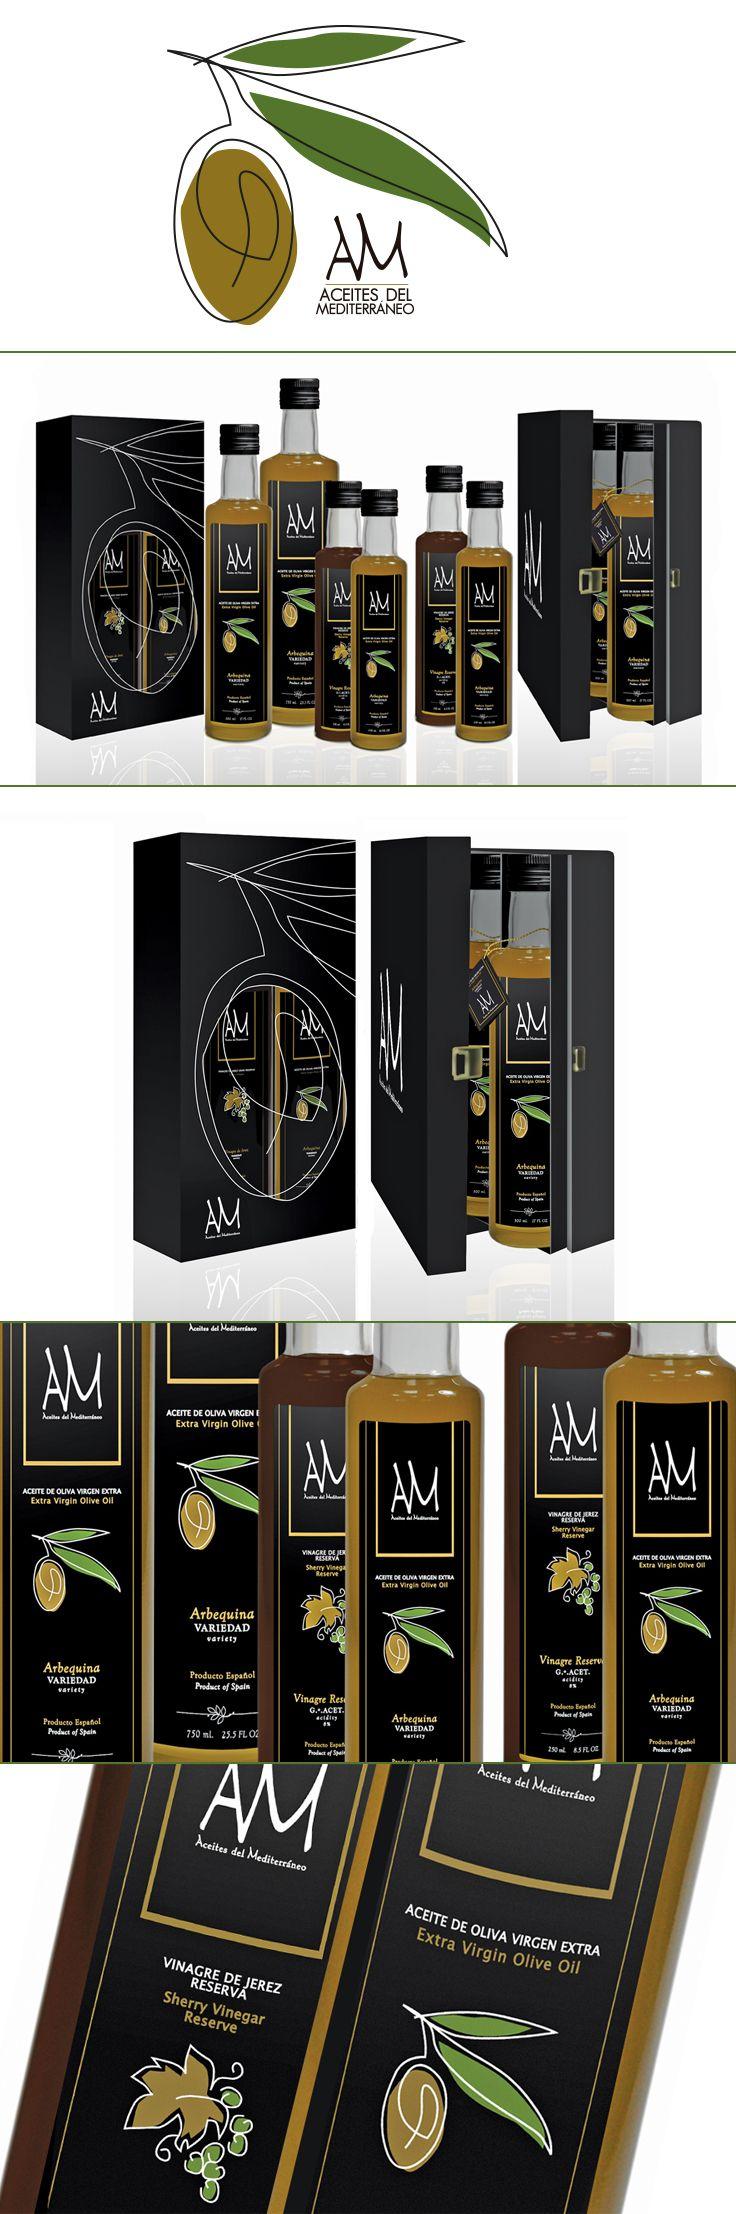 Diseño para las botellas y packaging de Aceites del Mediterráneo - Designed by LeBranders. handsome #oliveoil #packaging PD